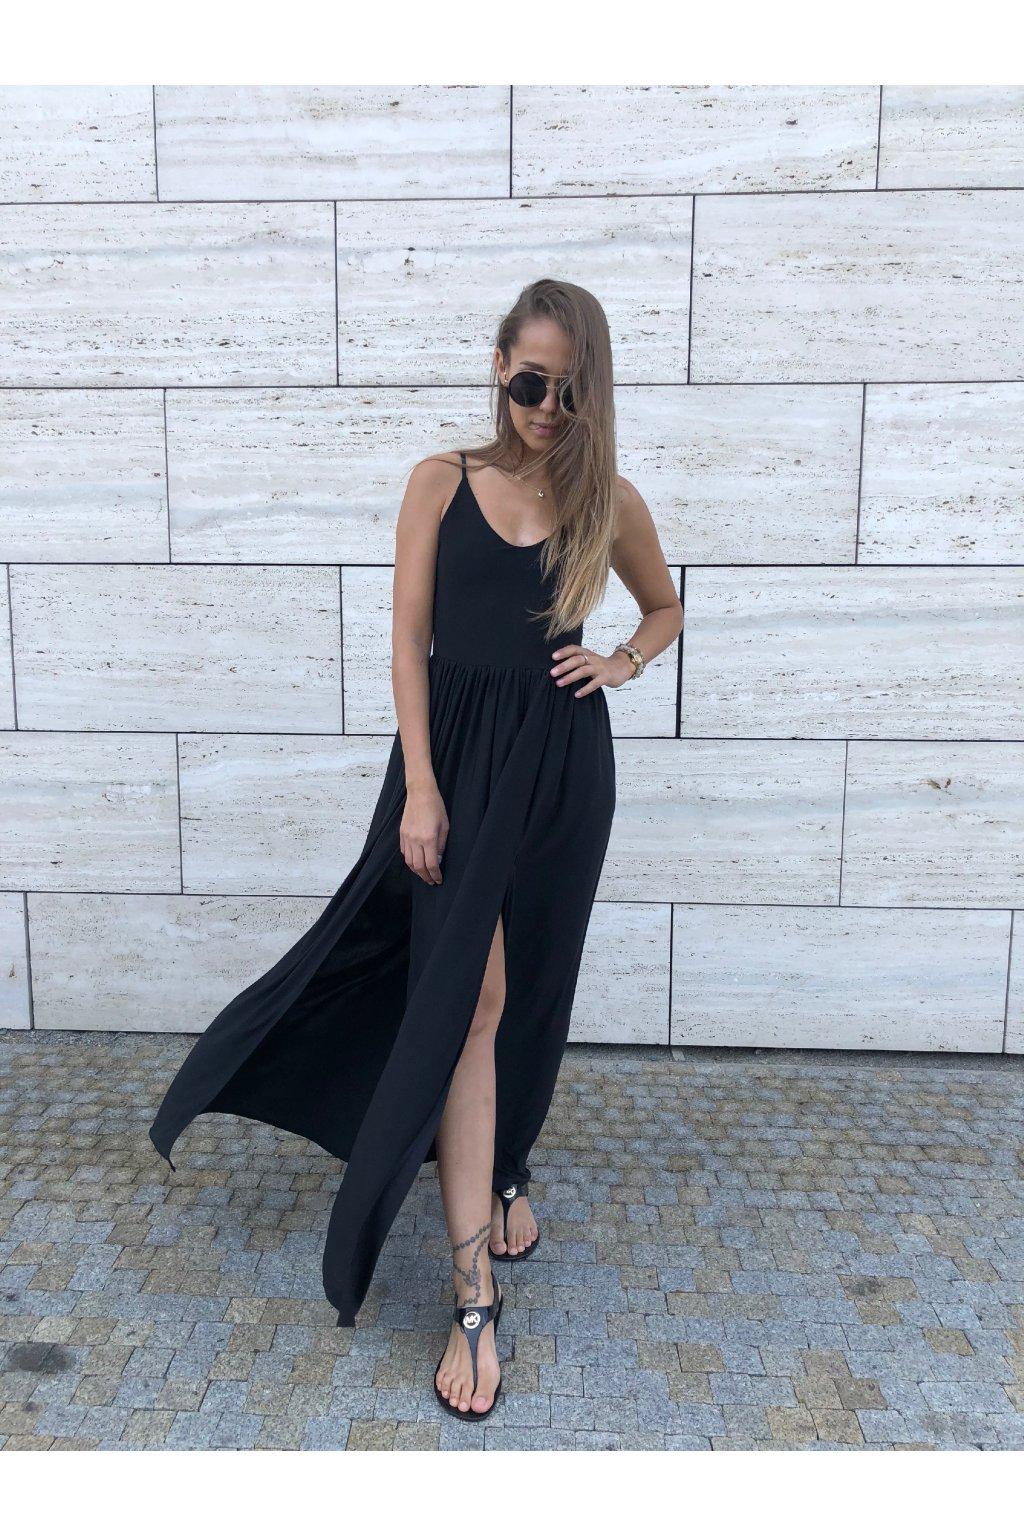 damske saty marion black eshopat cz 1